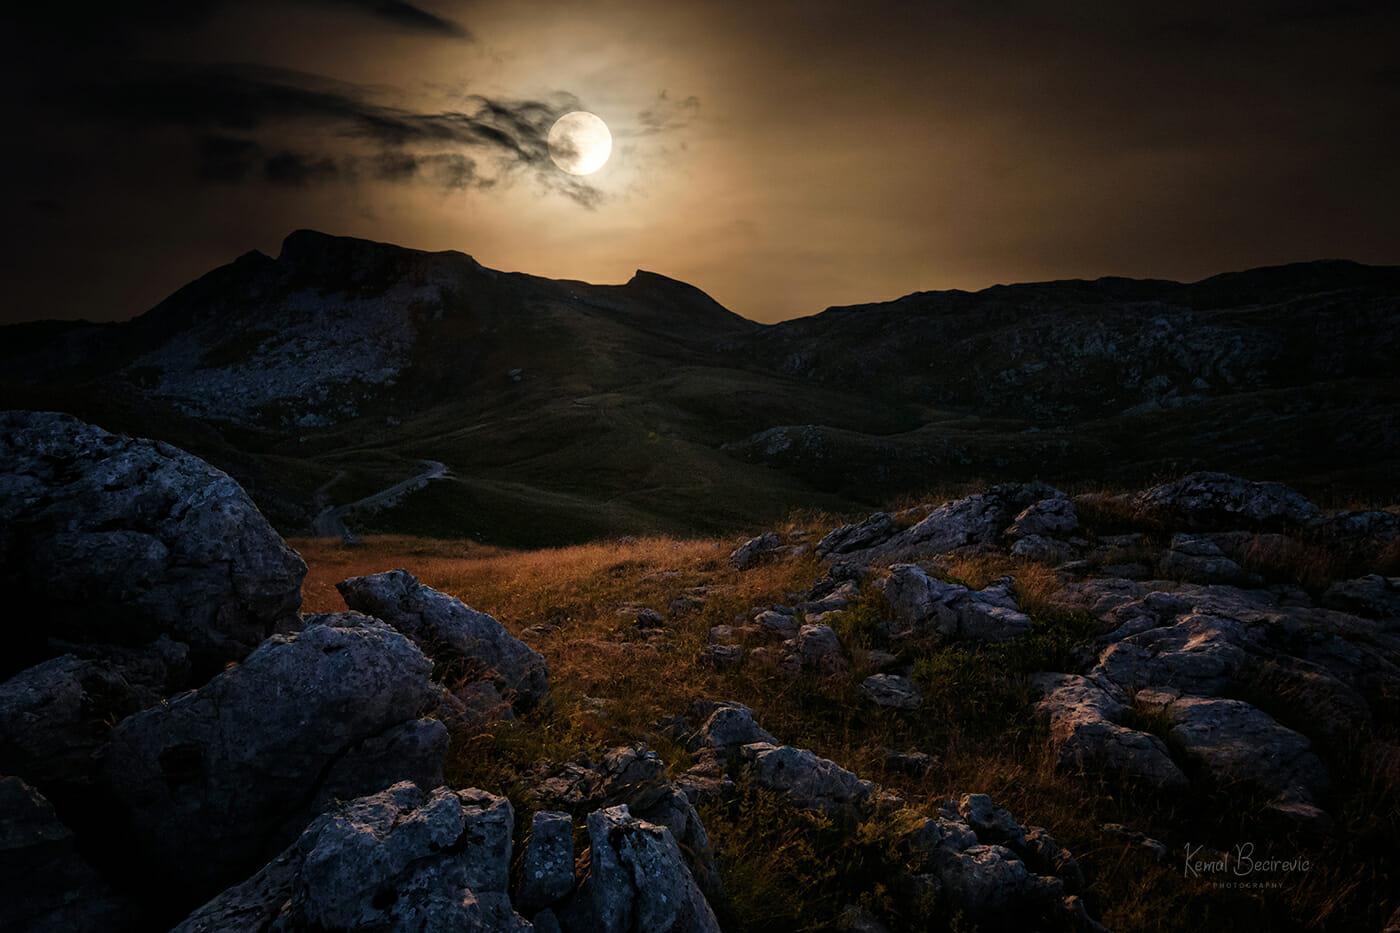 Moonlight Crveni Kuk, Visočica